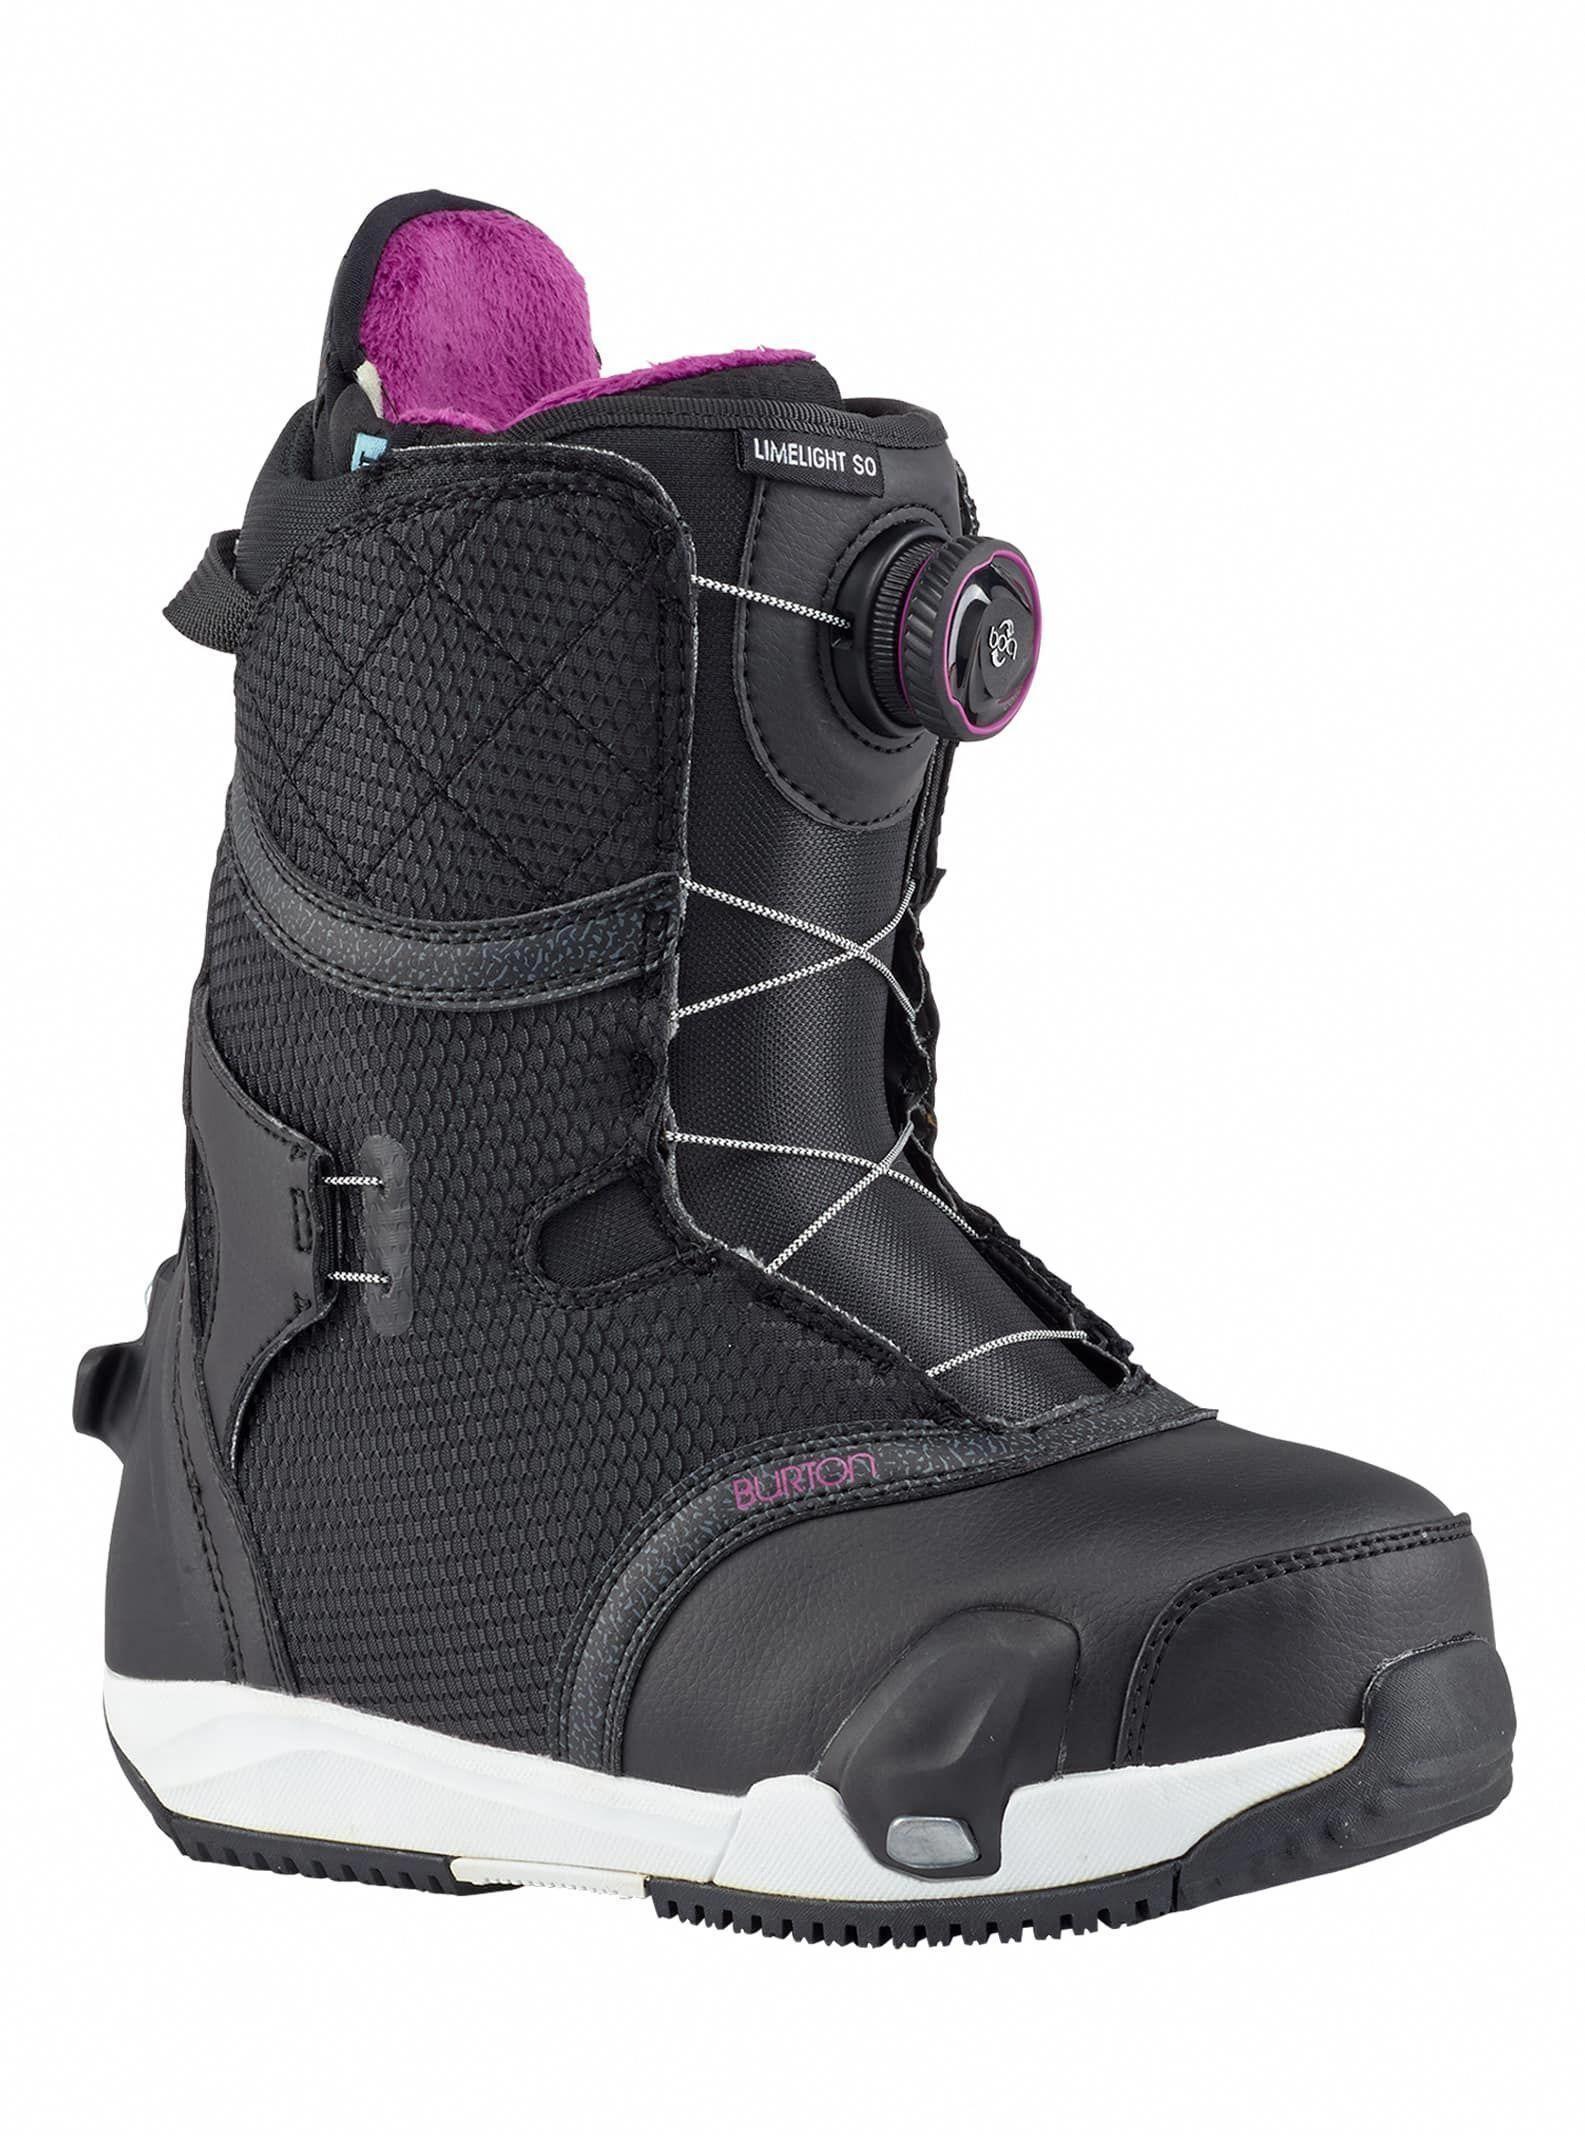 08fab50b5d1 Women s Burton Limelight Step On Snowboard Boot  Snow!!!  snowboardboots